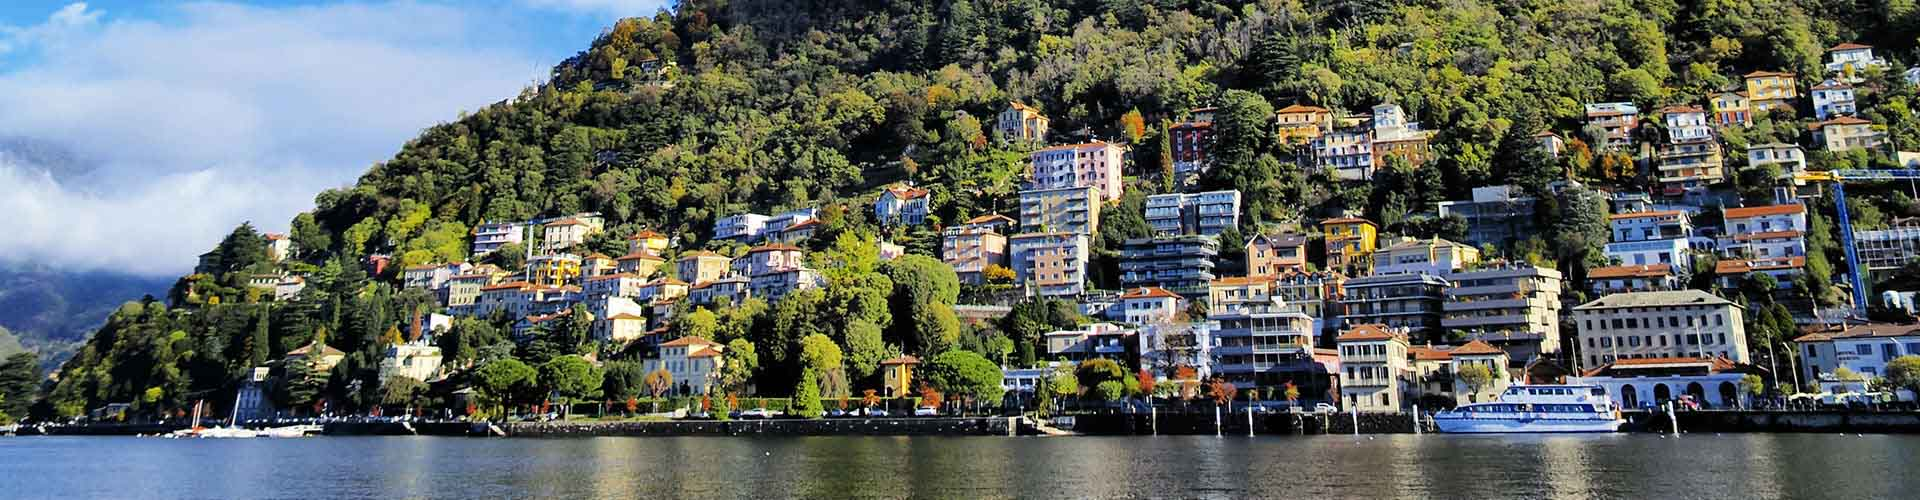 Lago de Como - Hoteles baratos en Lago de Como. Mapas de Lago de Como, Fotos y comentarios de cada Hotel en Lago de Como.